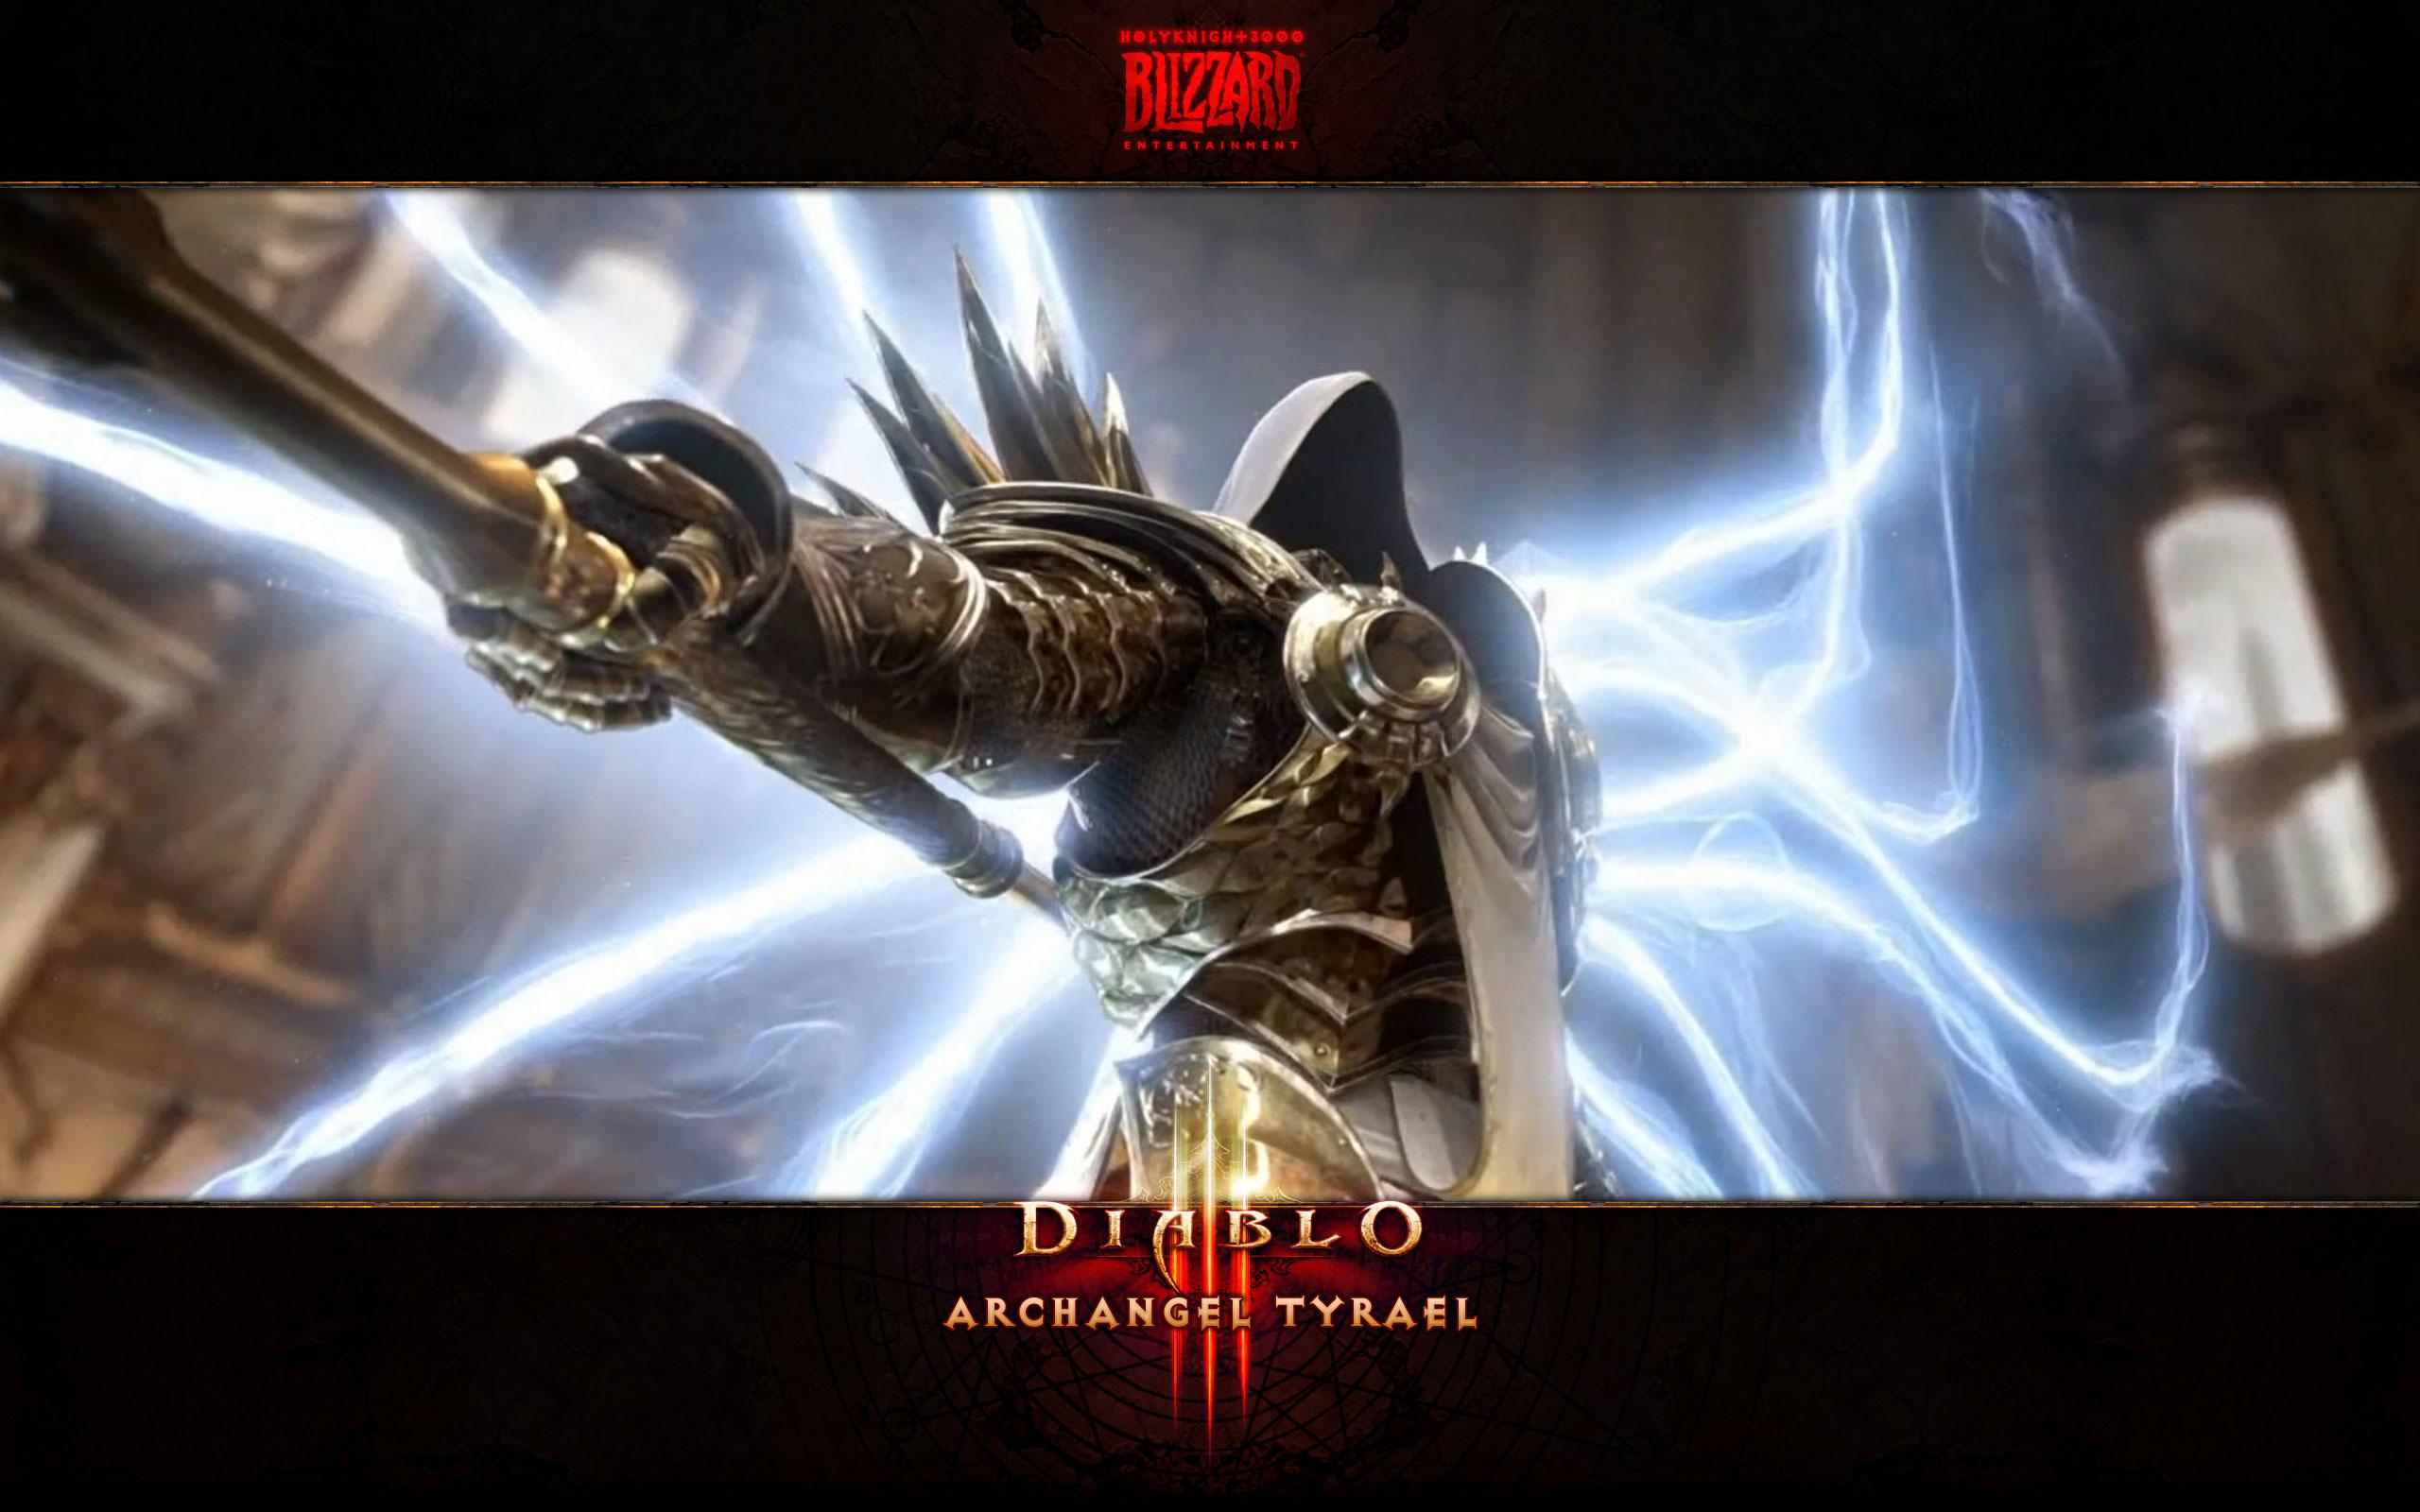 Diablo 3 wallpaper 21